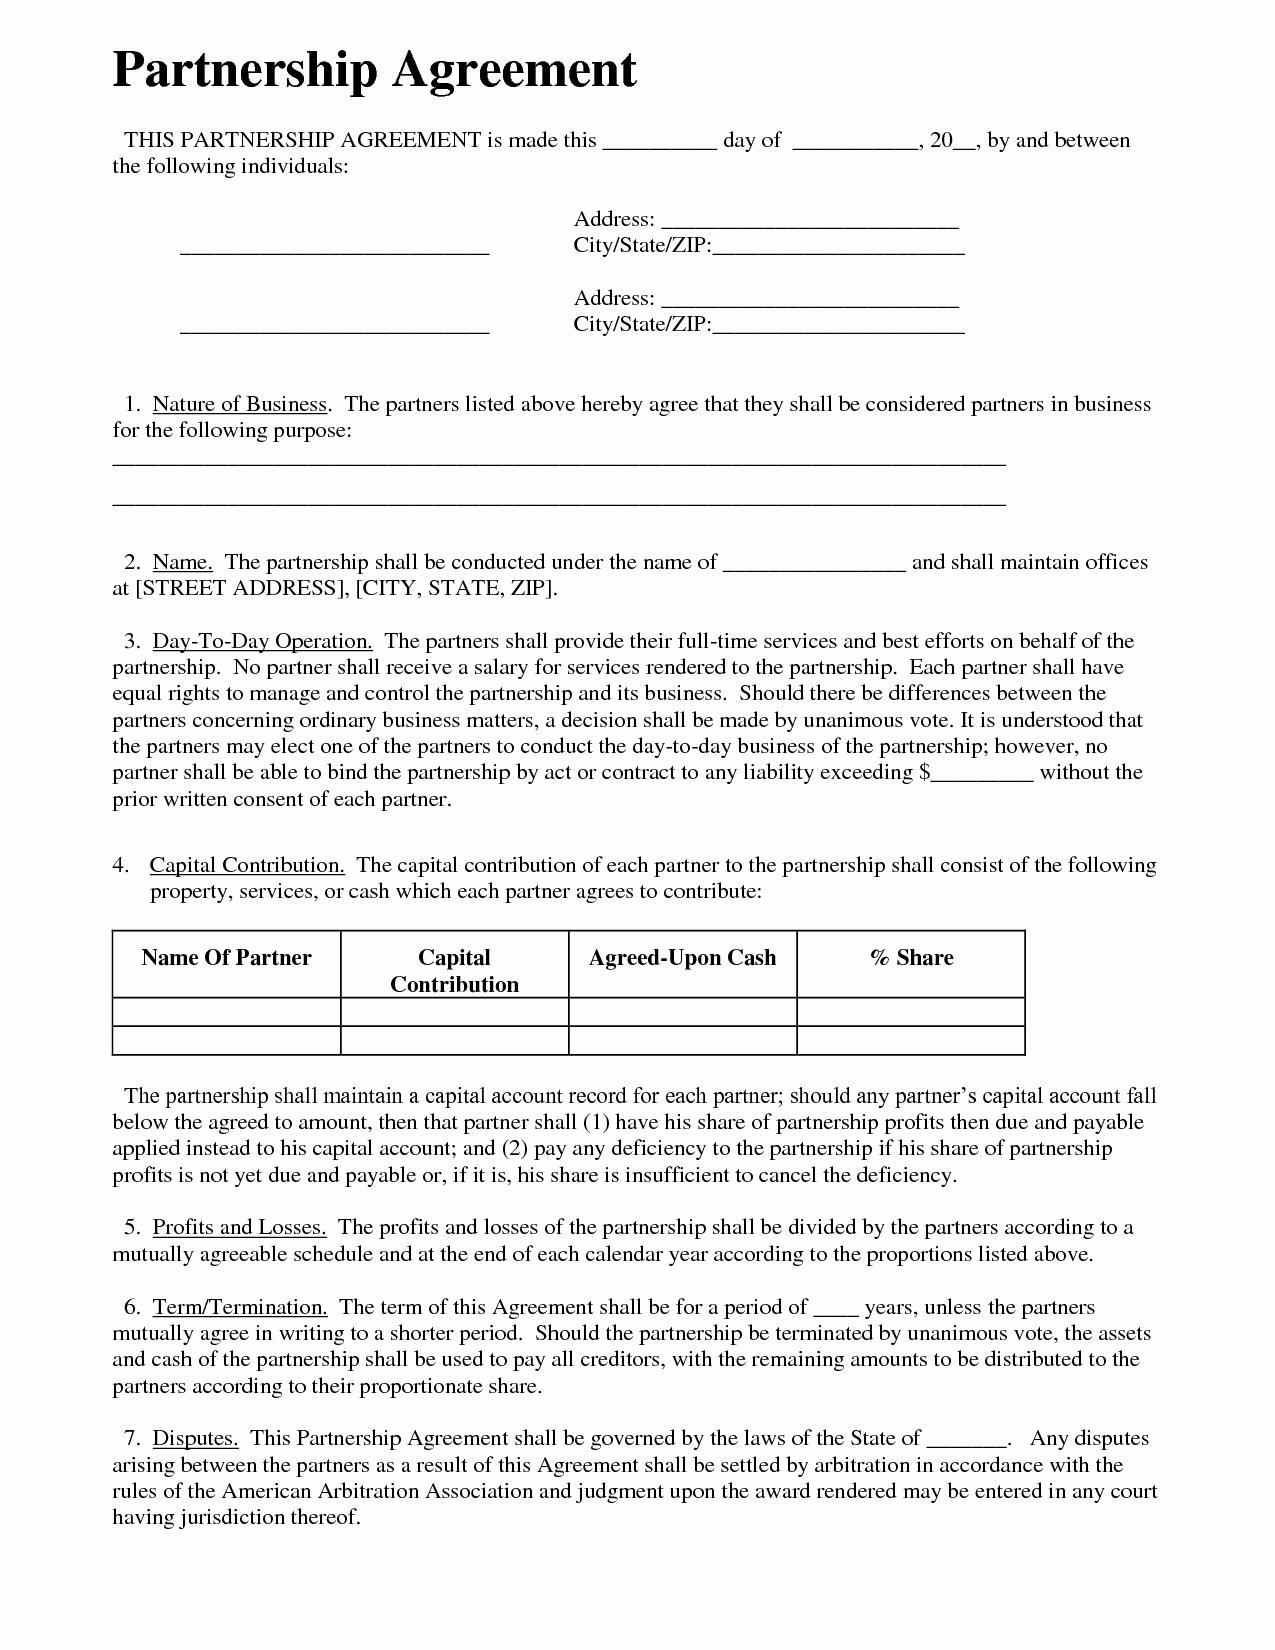 Partnership Buyout Agreement Template Beautiful Partnership Agreement Business Templates